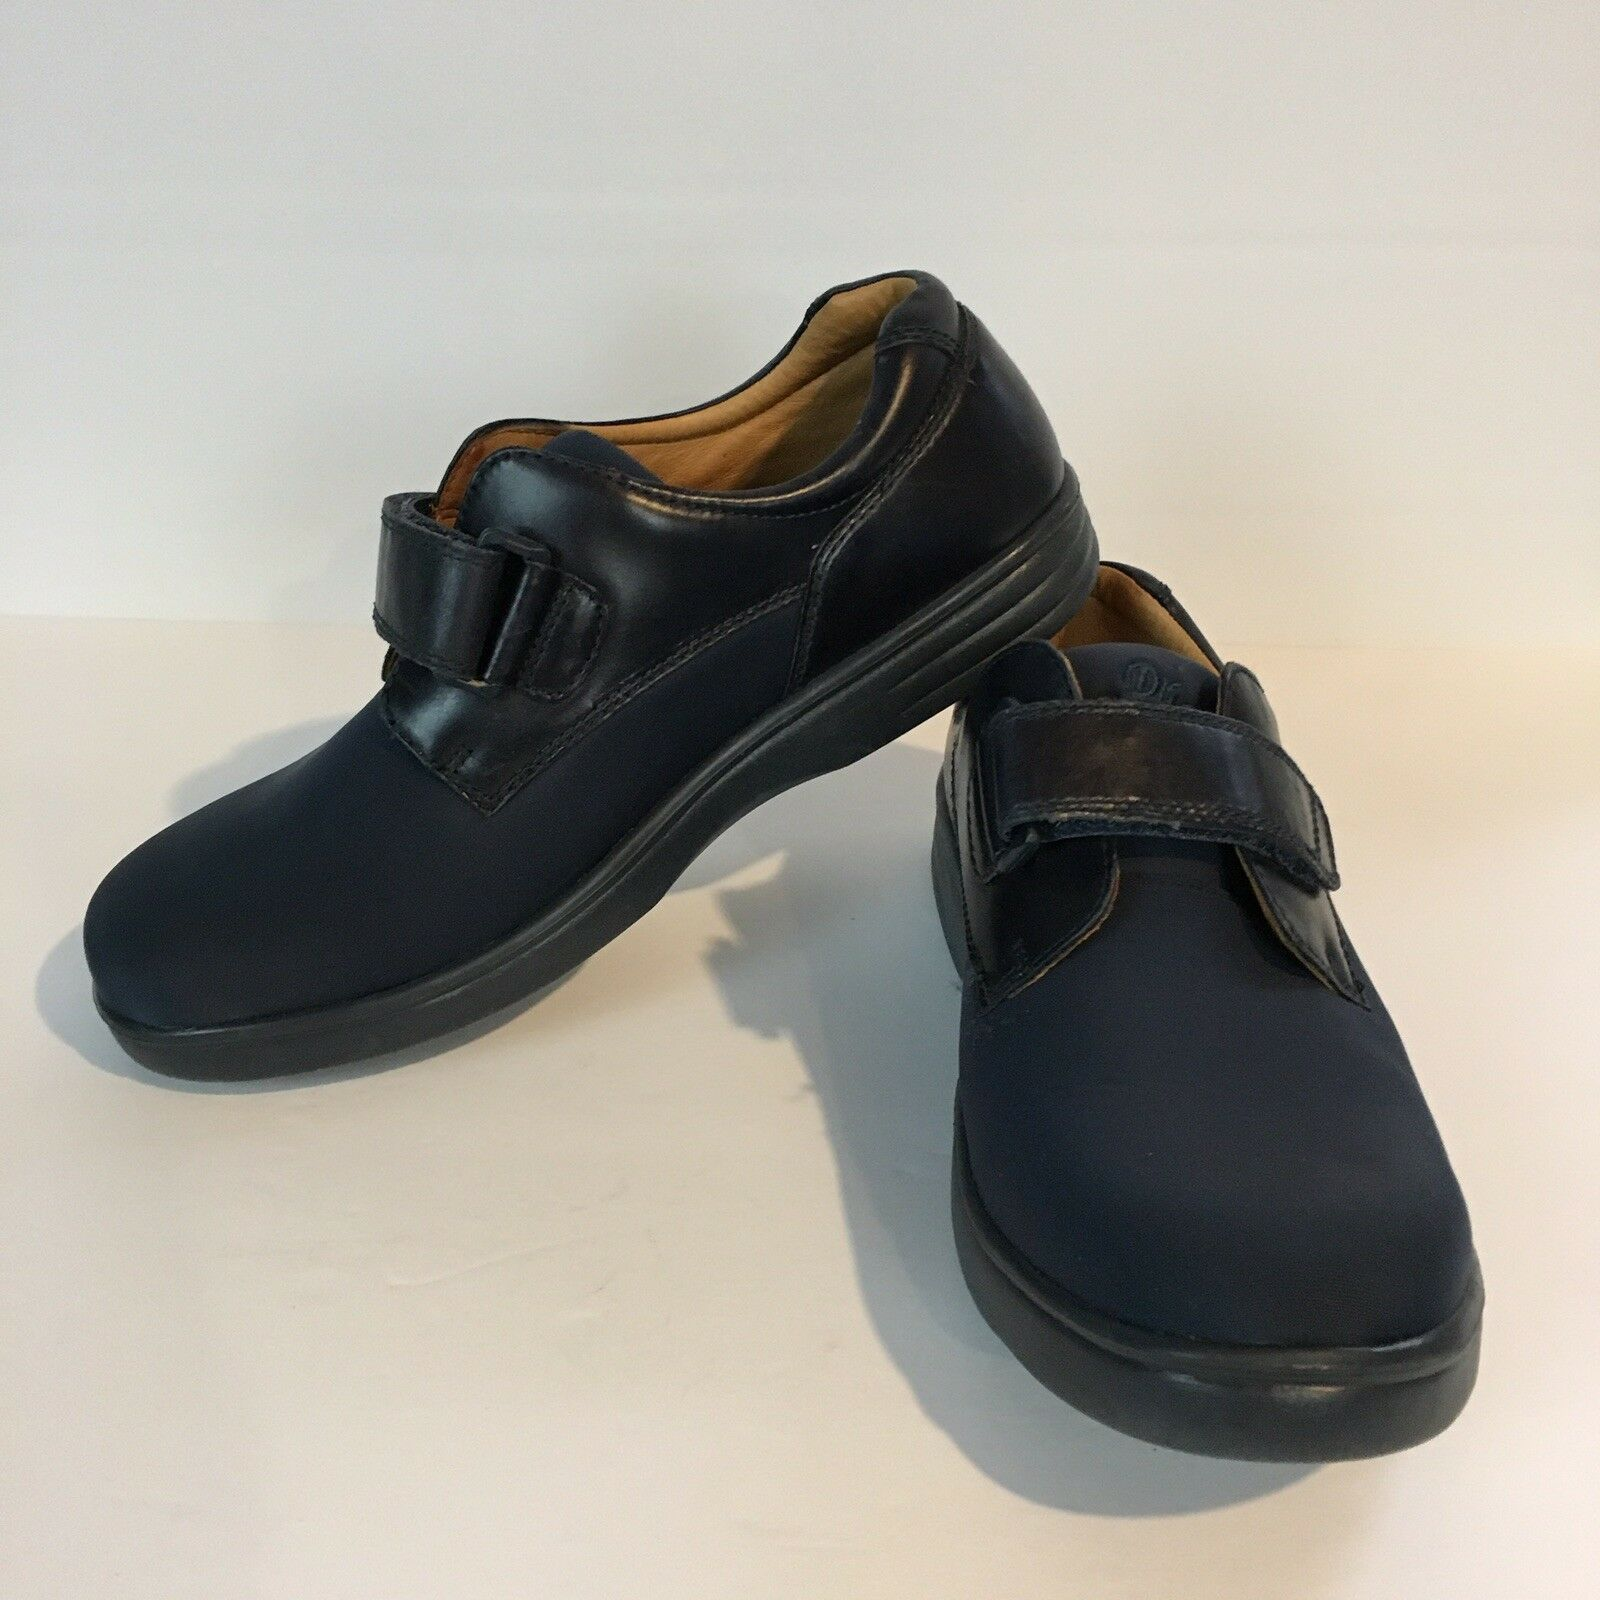 Dr. Comfort 4550 Annie 9.5W Orthopedtic Diabetic Loafers Damens Blau Leder Schuhe